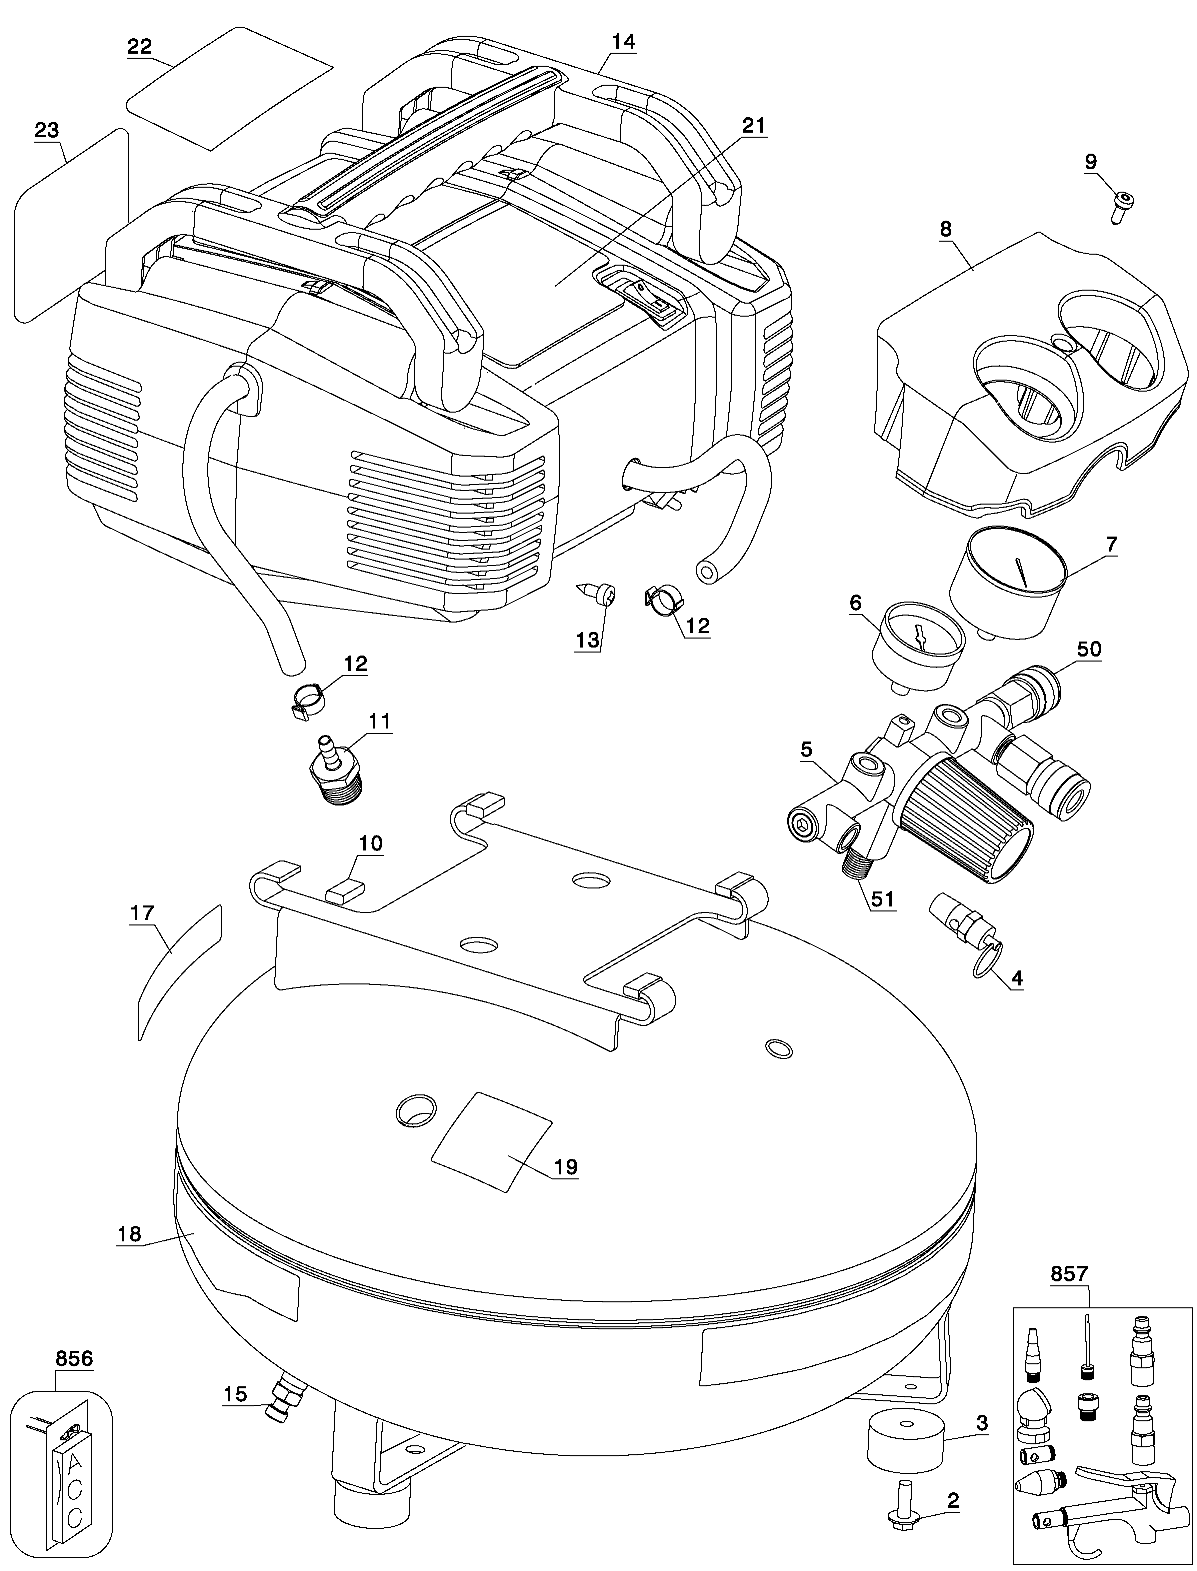 Porter Cable pancake compressor parts